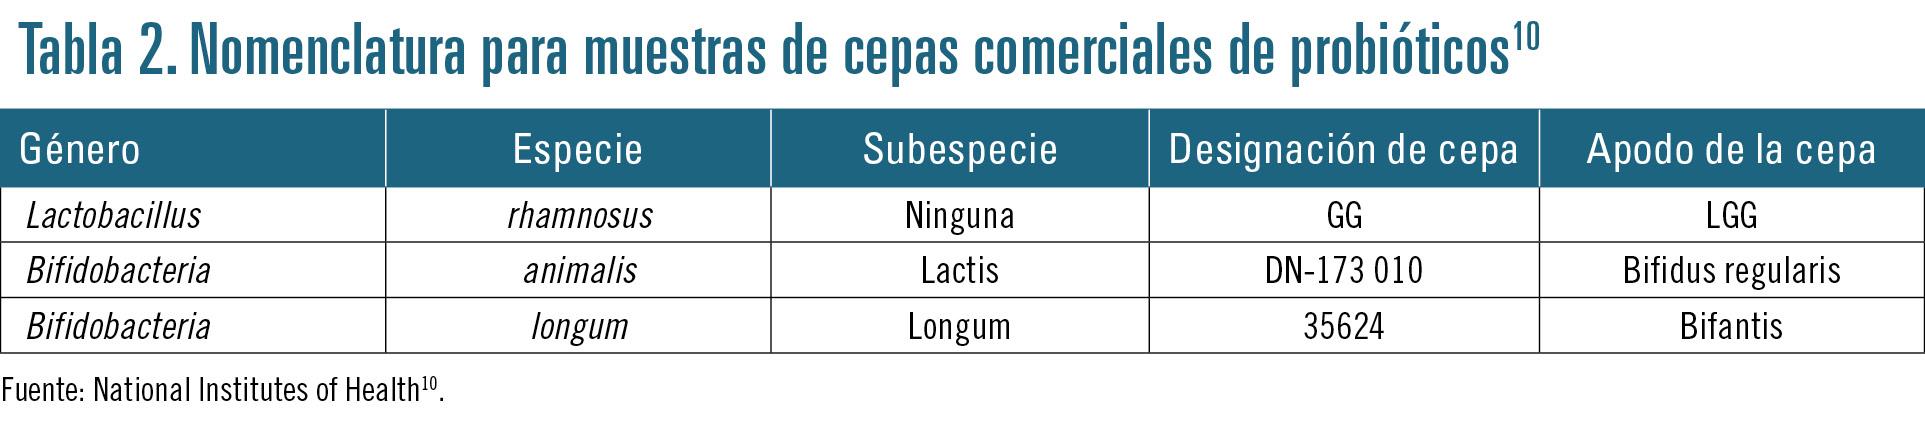 27 EF589 PROFESION bienestar intestinal tabla 2